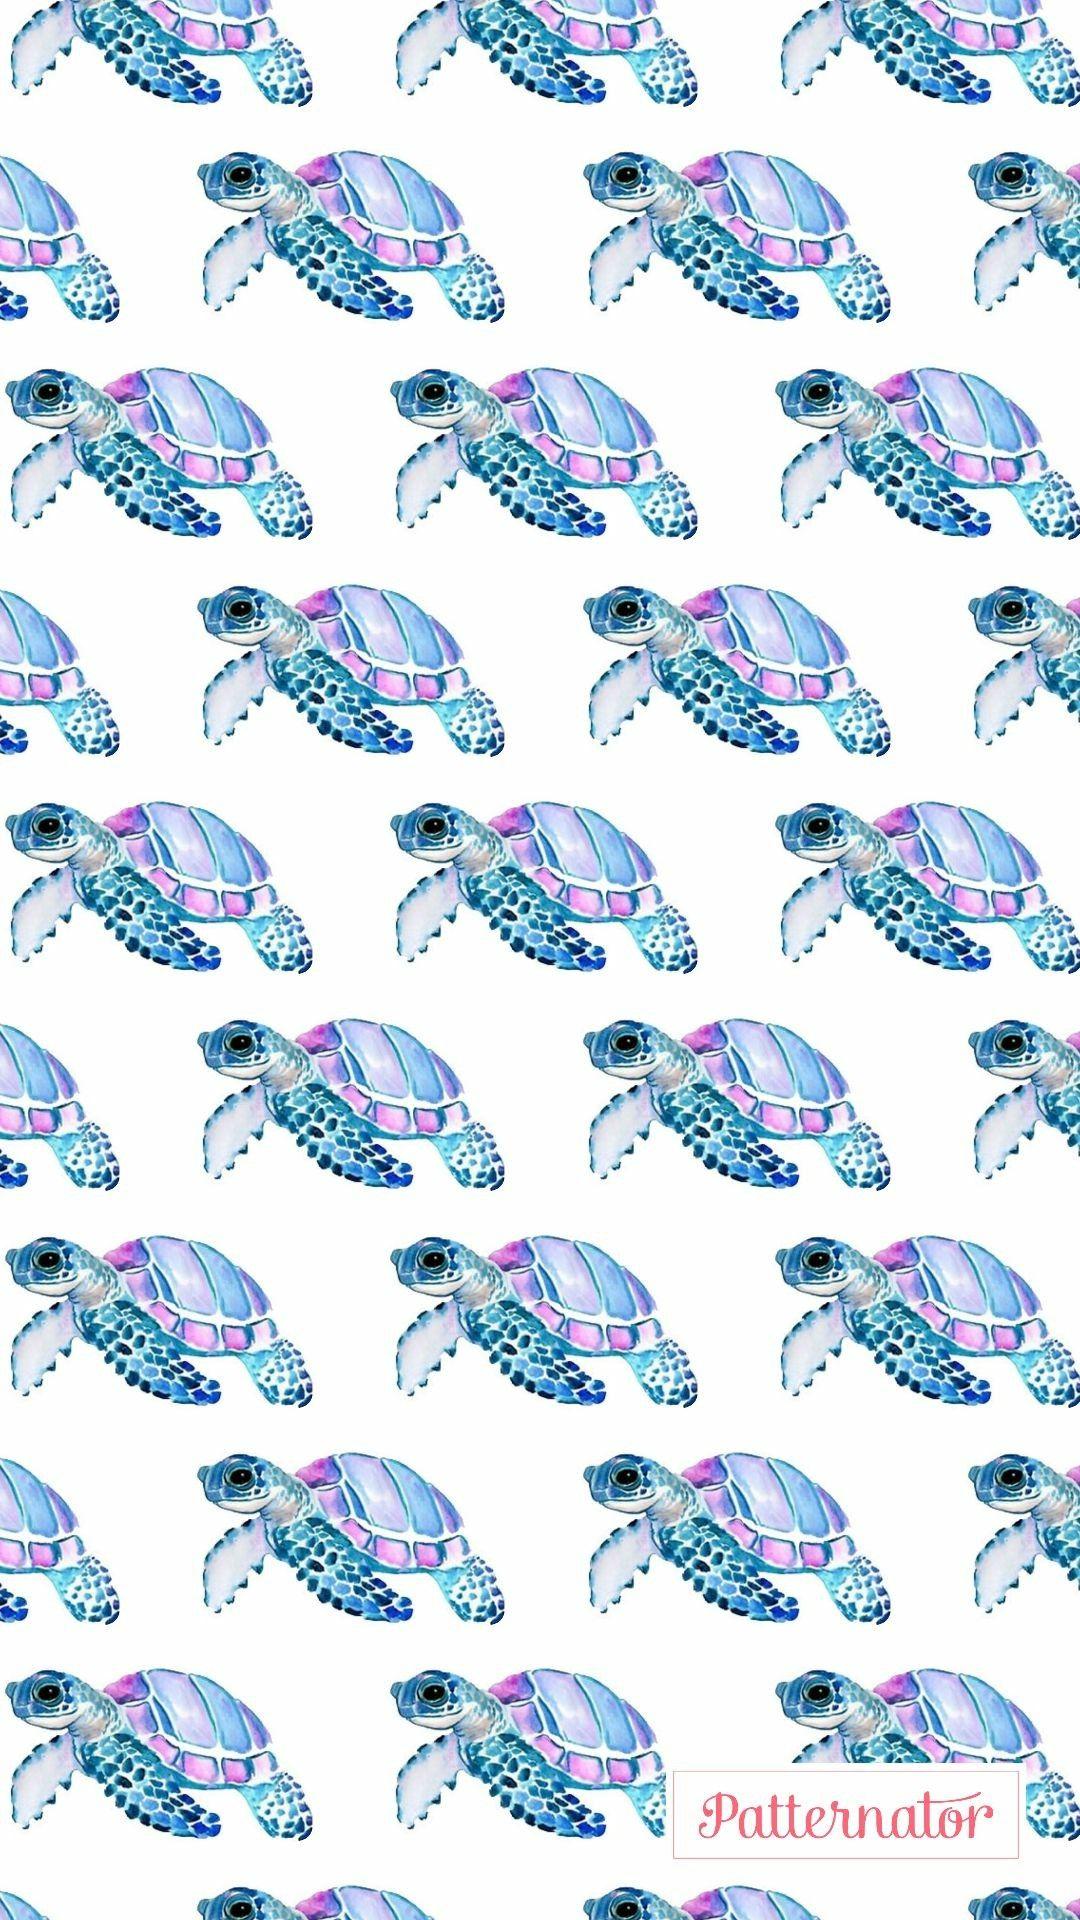 Wallpaper Tartaruga Flower Background Wallpaper Iphone Background Wallpaper Turtle Wallpaper